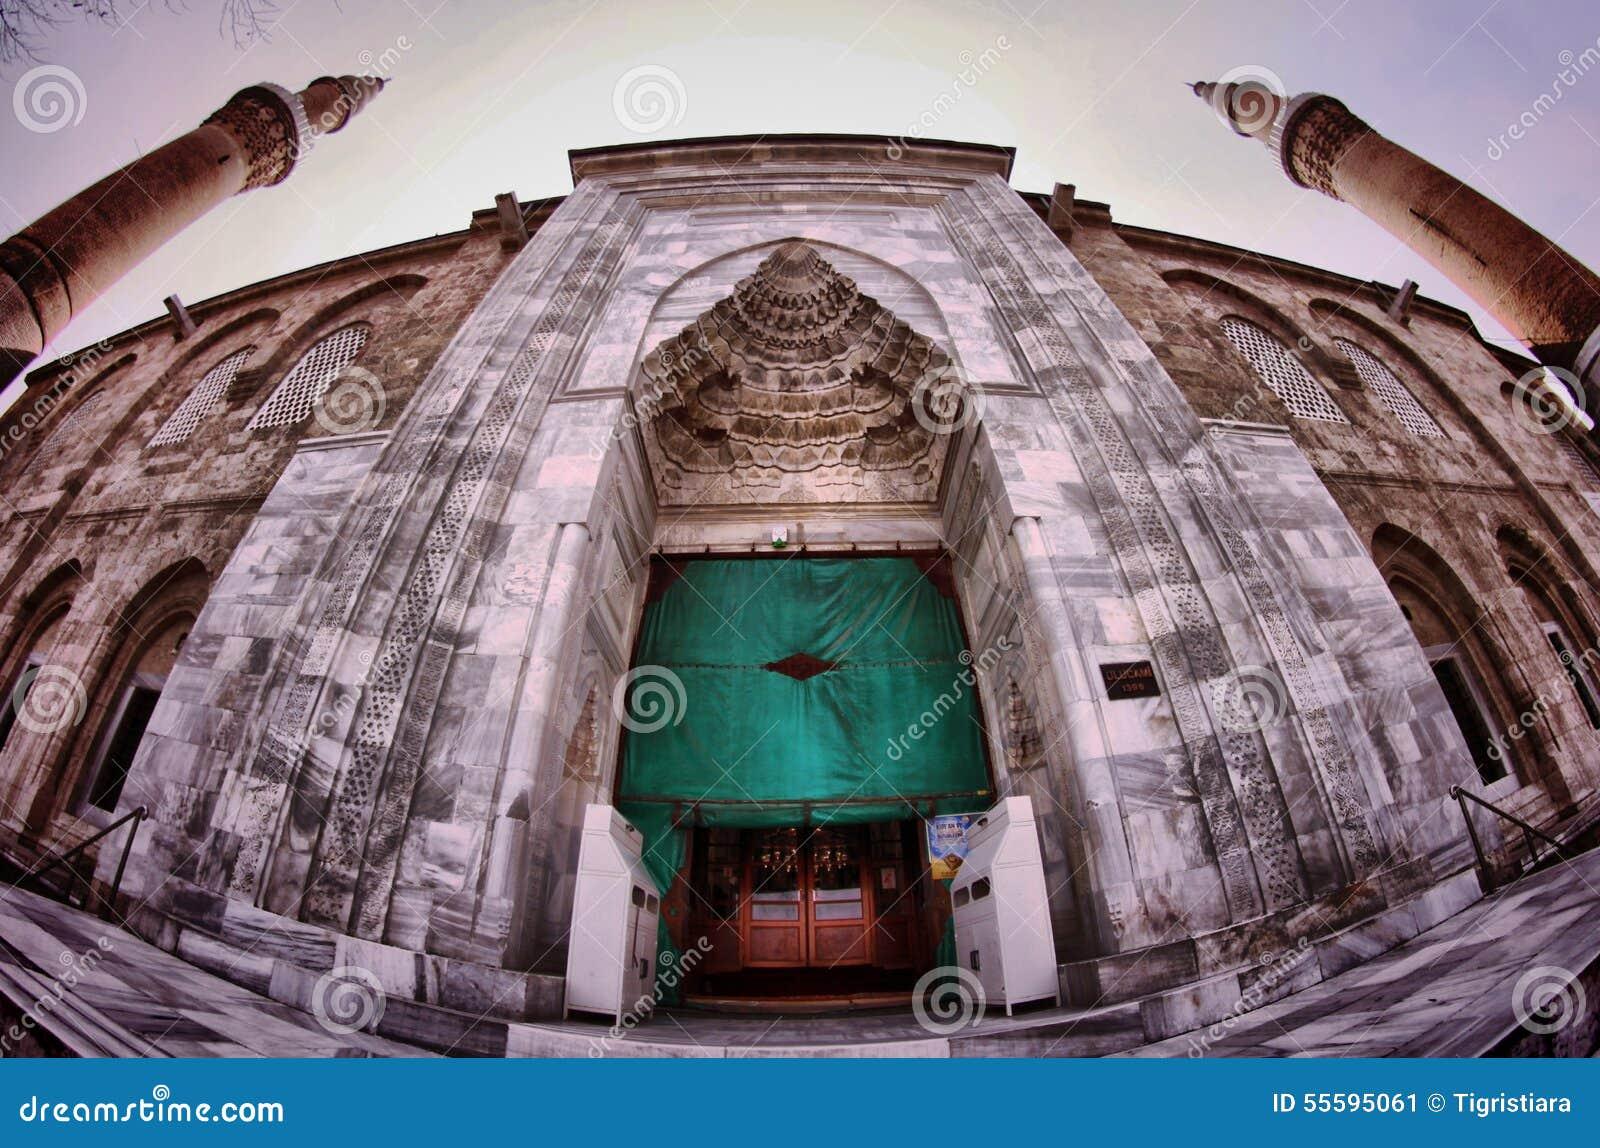 Bursa Ulu Camii Great Mosque